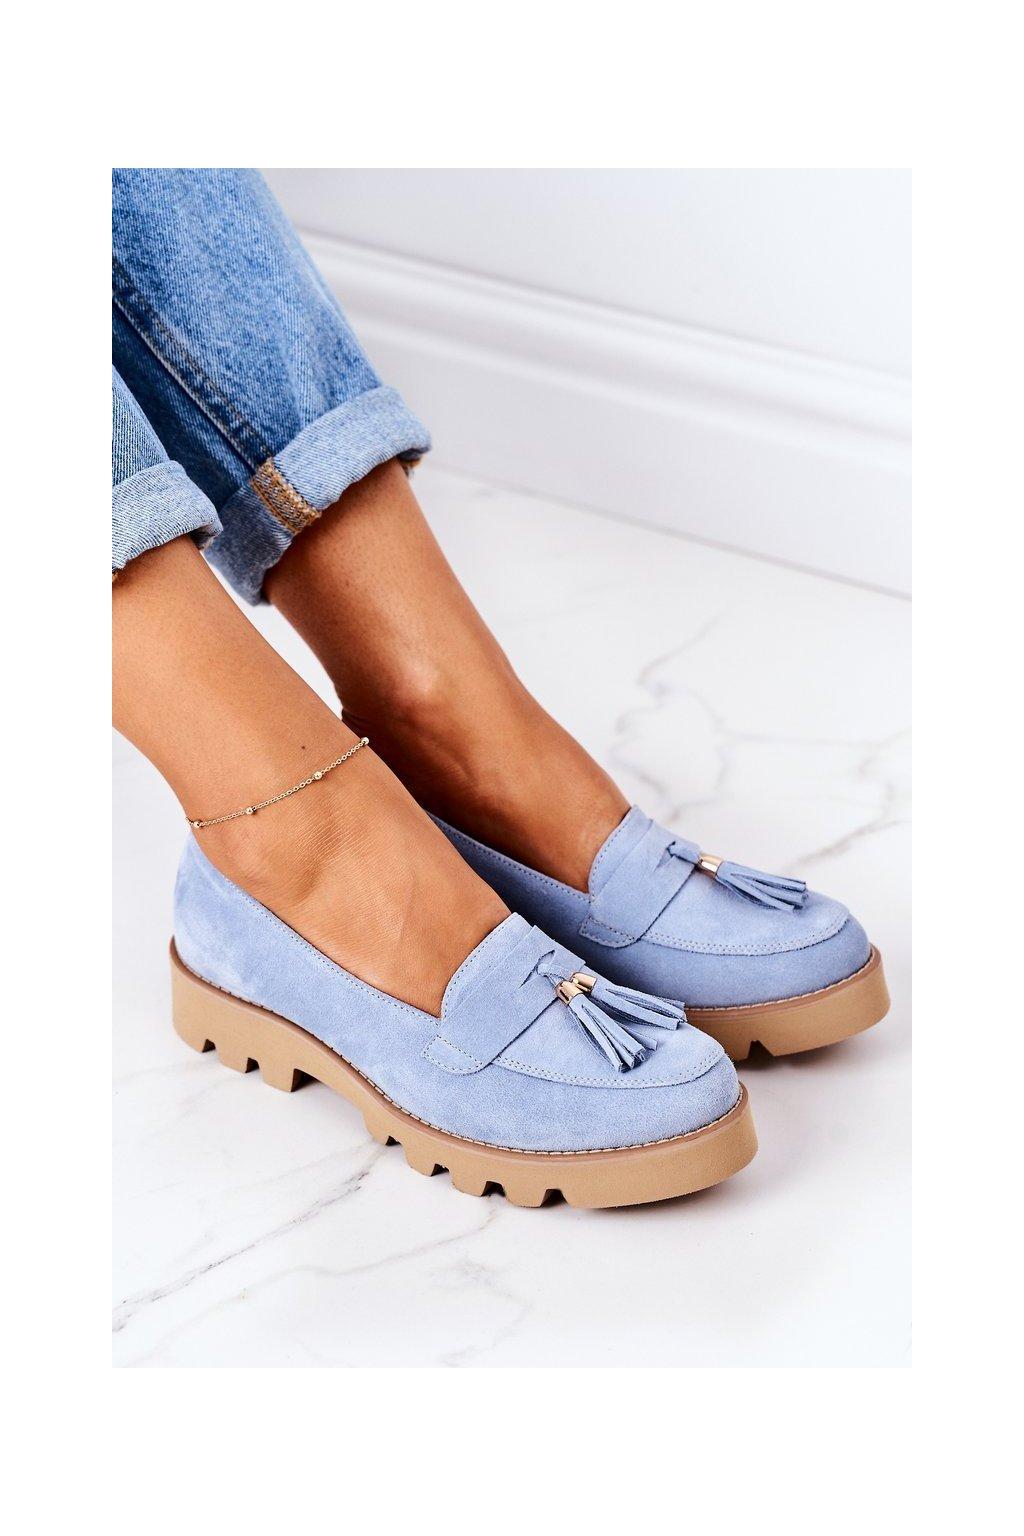 Dámske mokasíny farba modrá kód obuvi 3053 BŁĘKIT